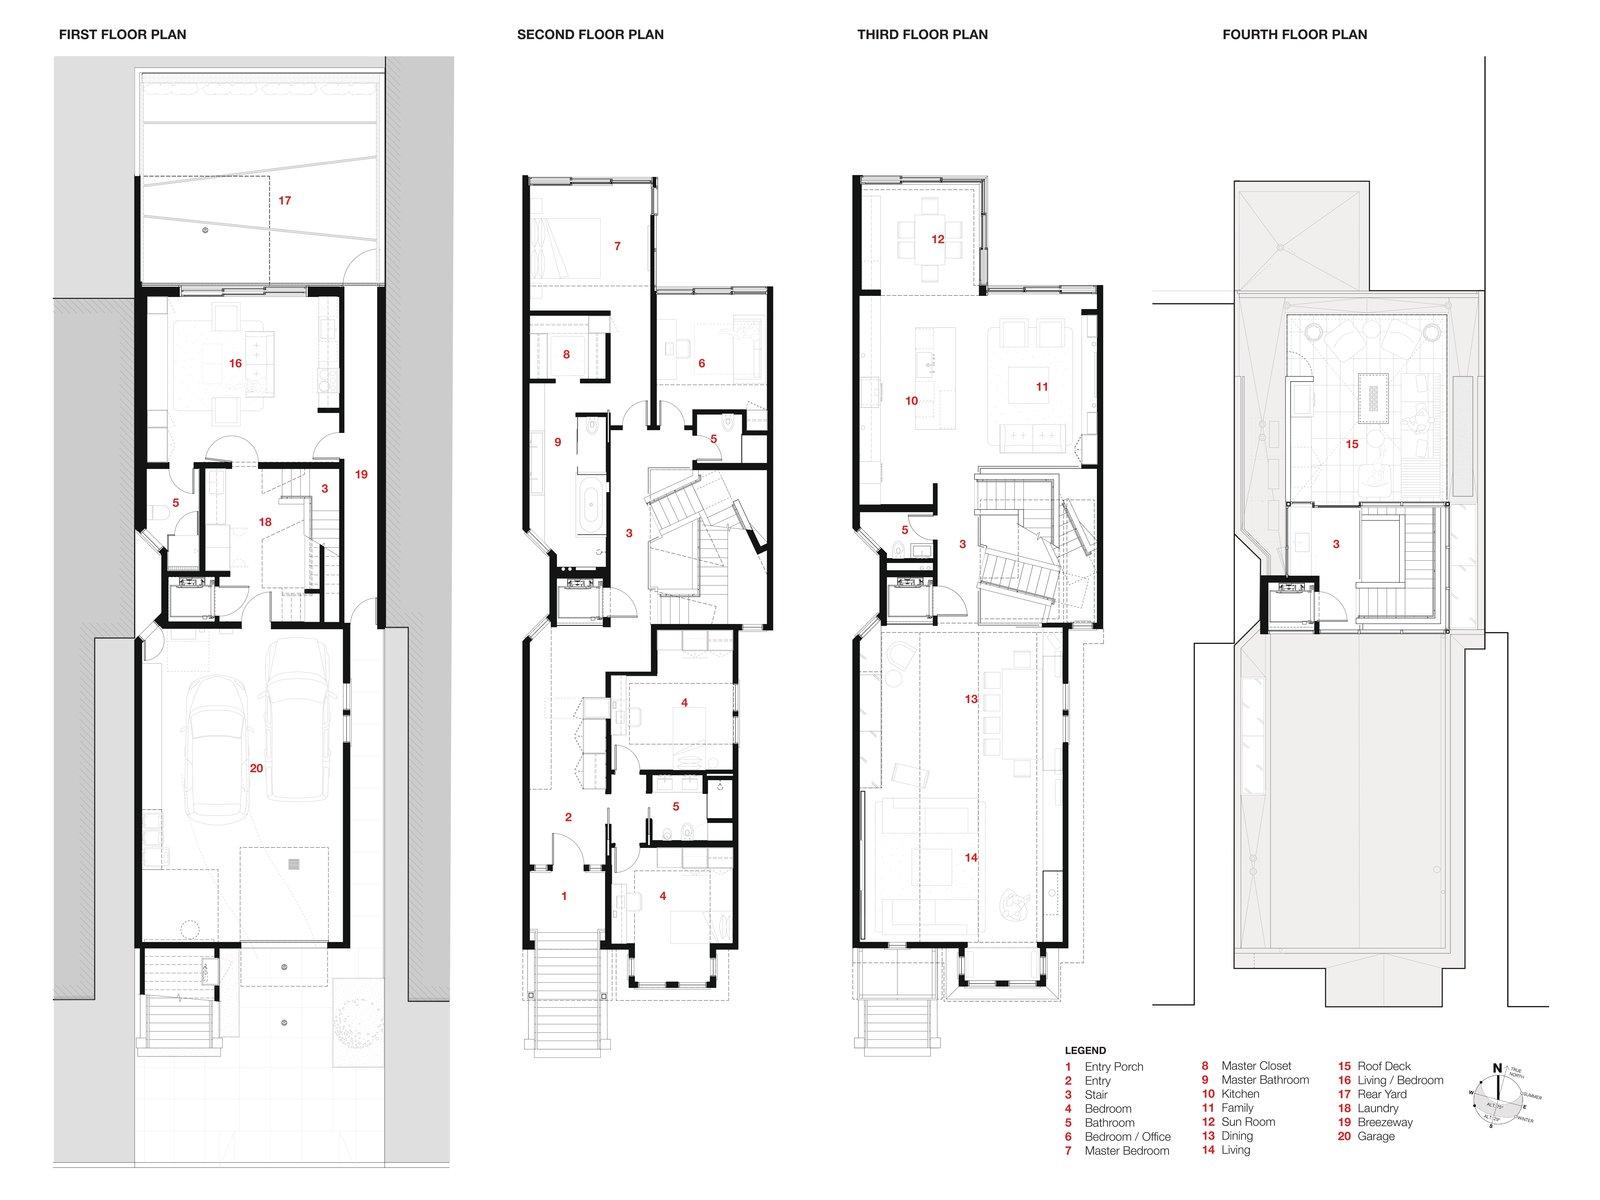 San francisco townhouse floor plans for Large townhouse floor plans